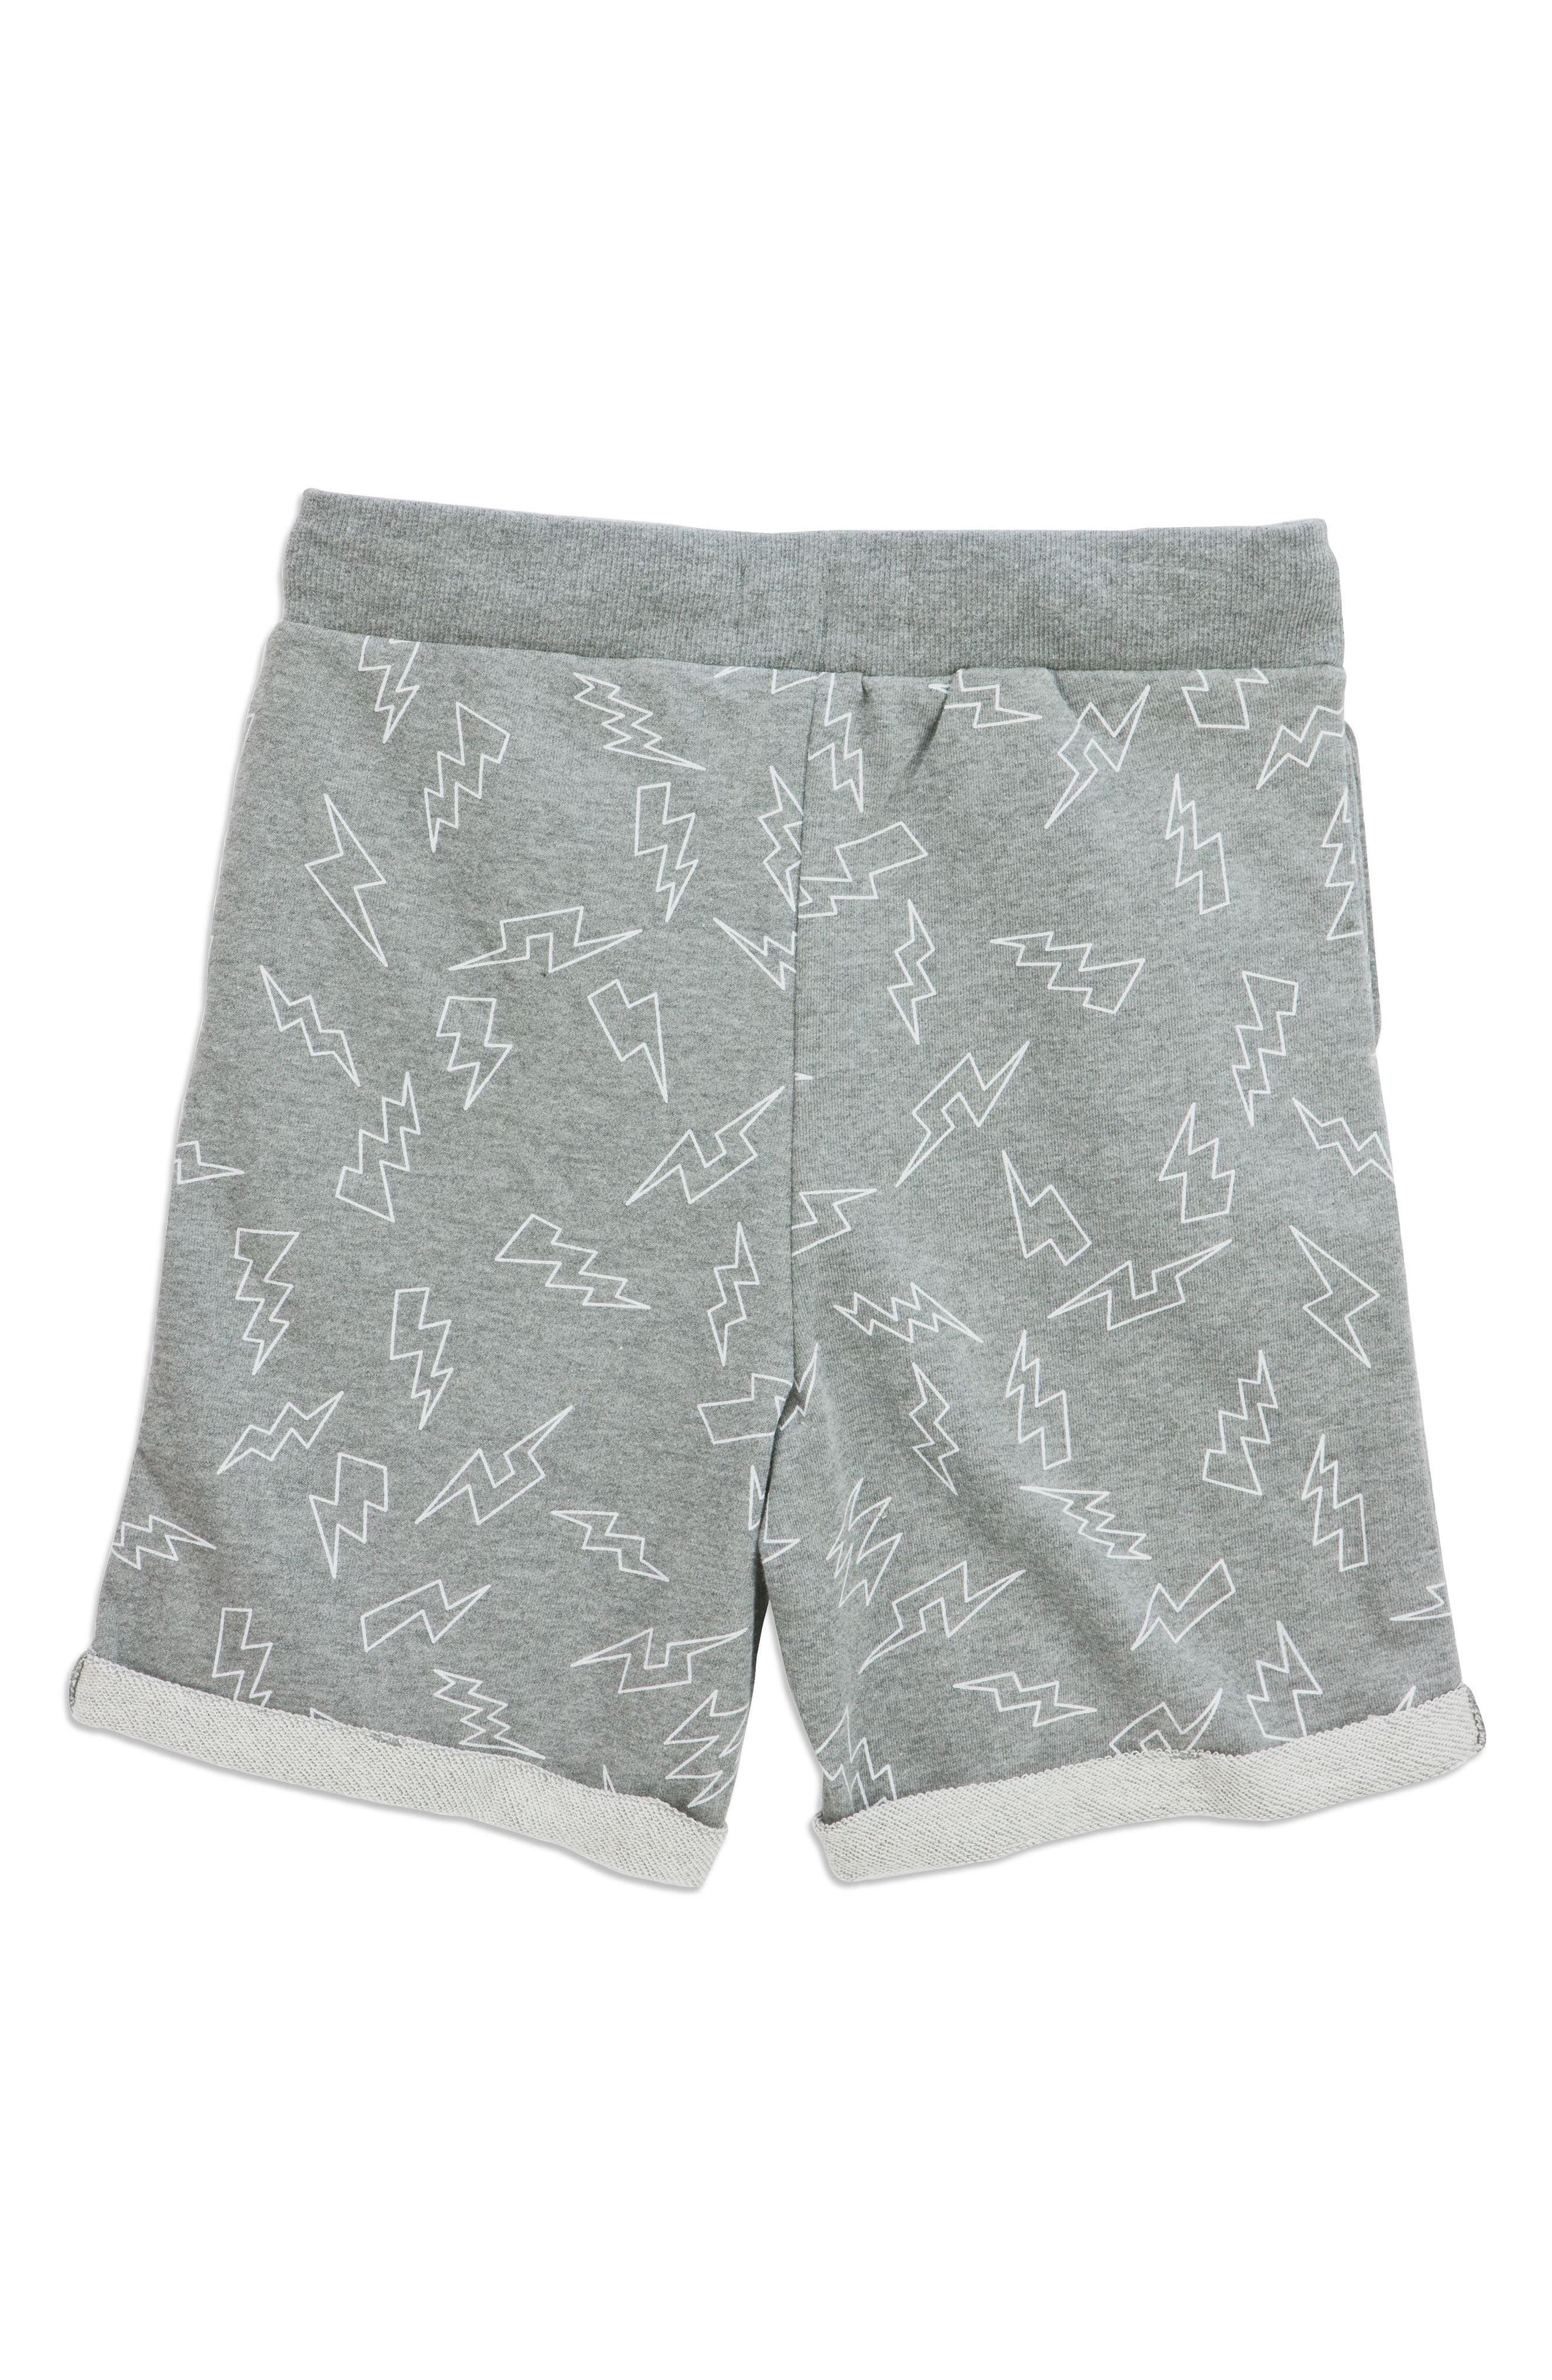 Electric Adriel Knit Shorts,                             Alternate thumbnail 2, color,                             020